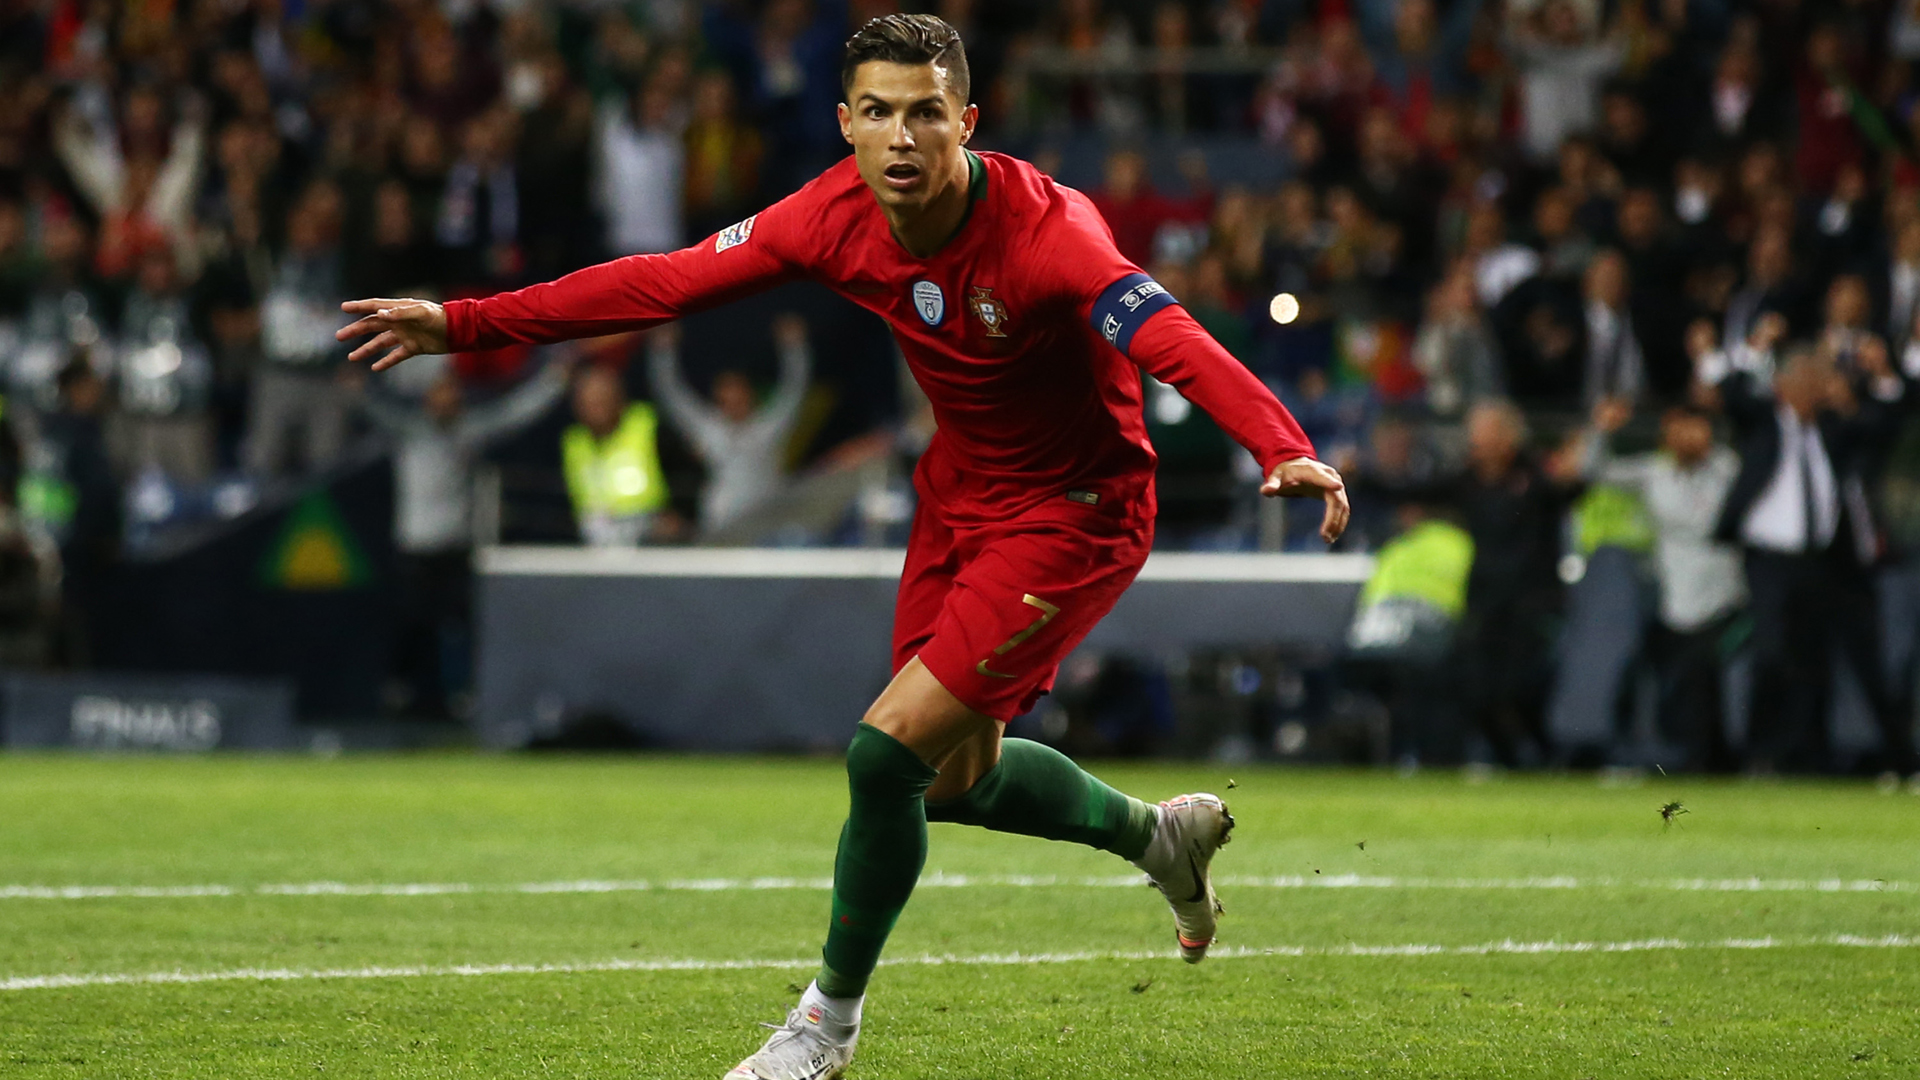 Ronaldo is a football genius – Santos hails Portugal star